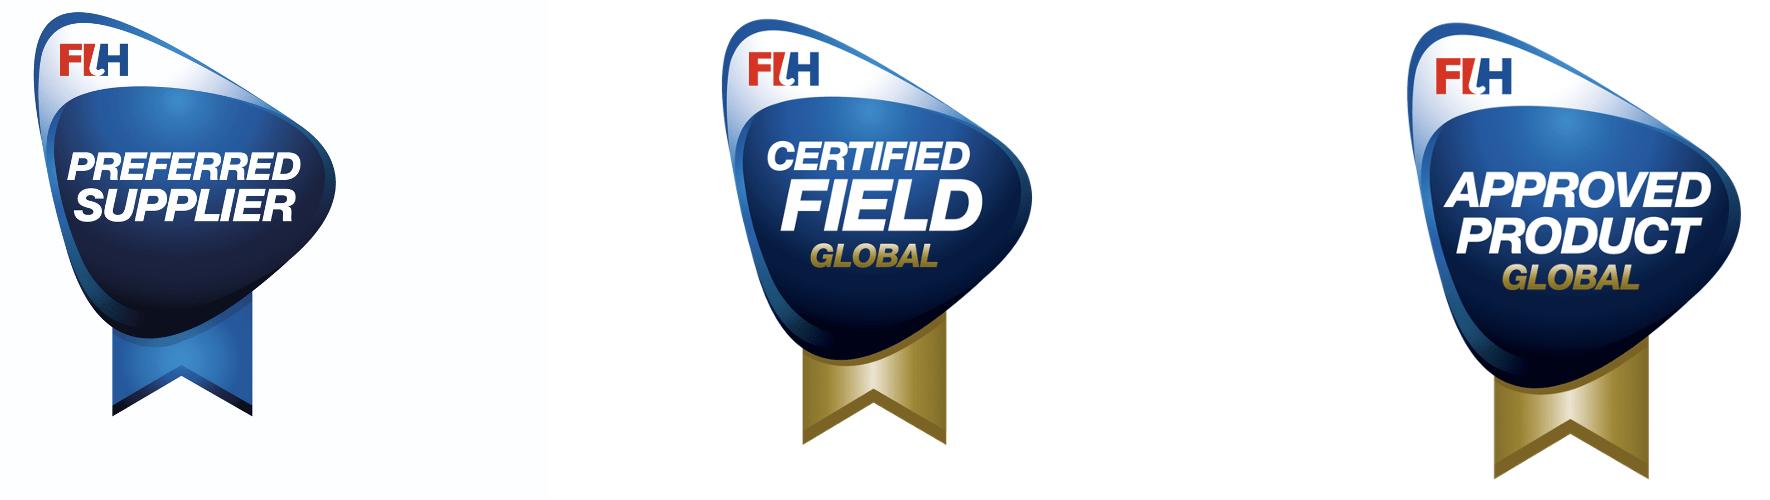 FIH Accreditations